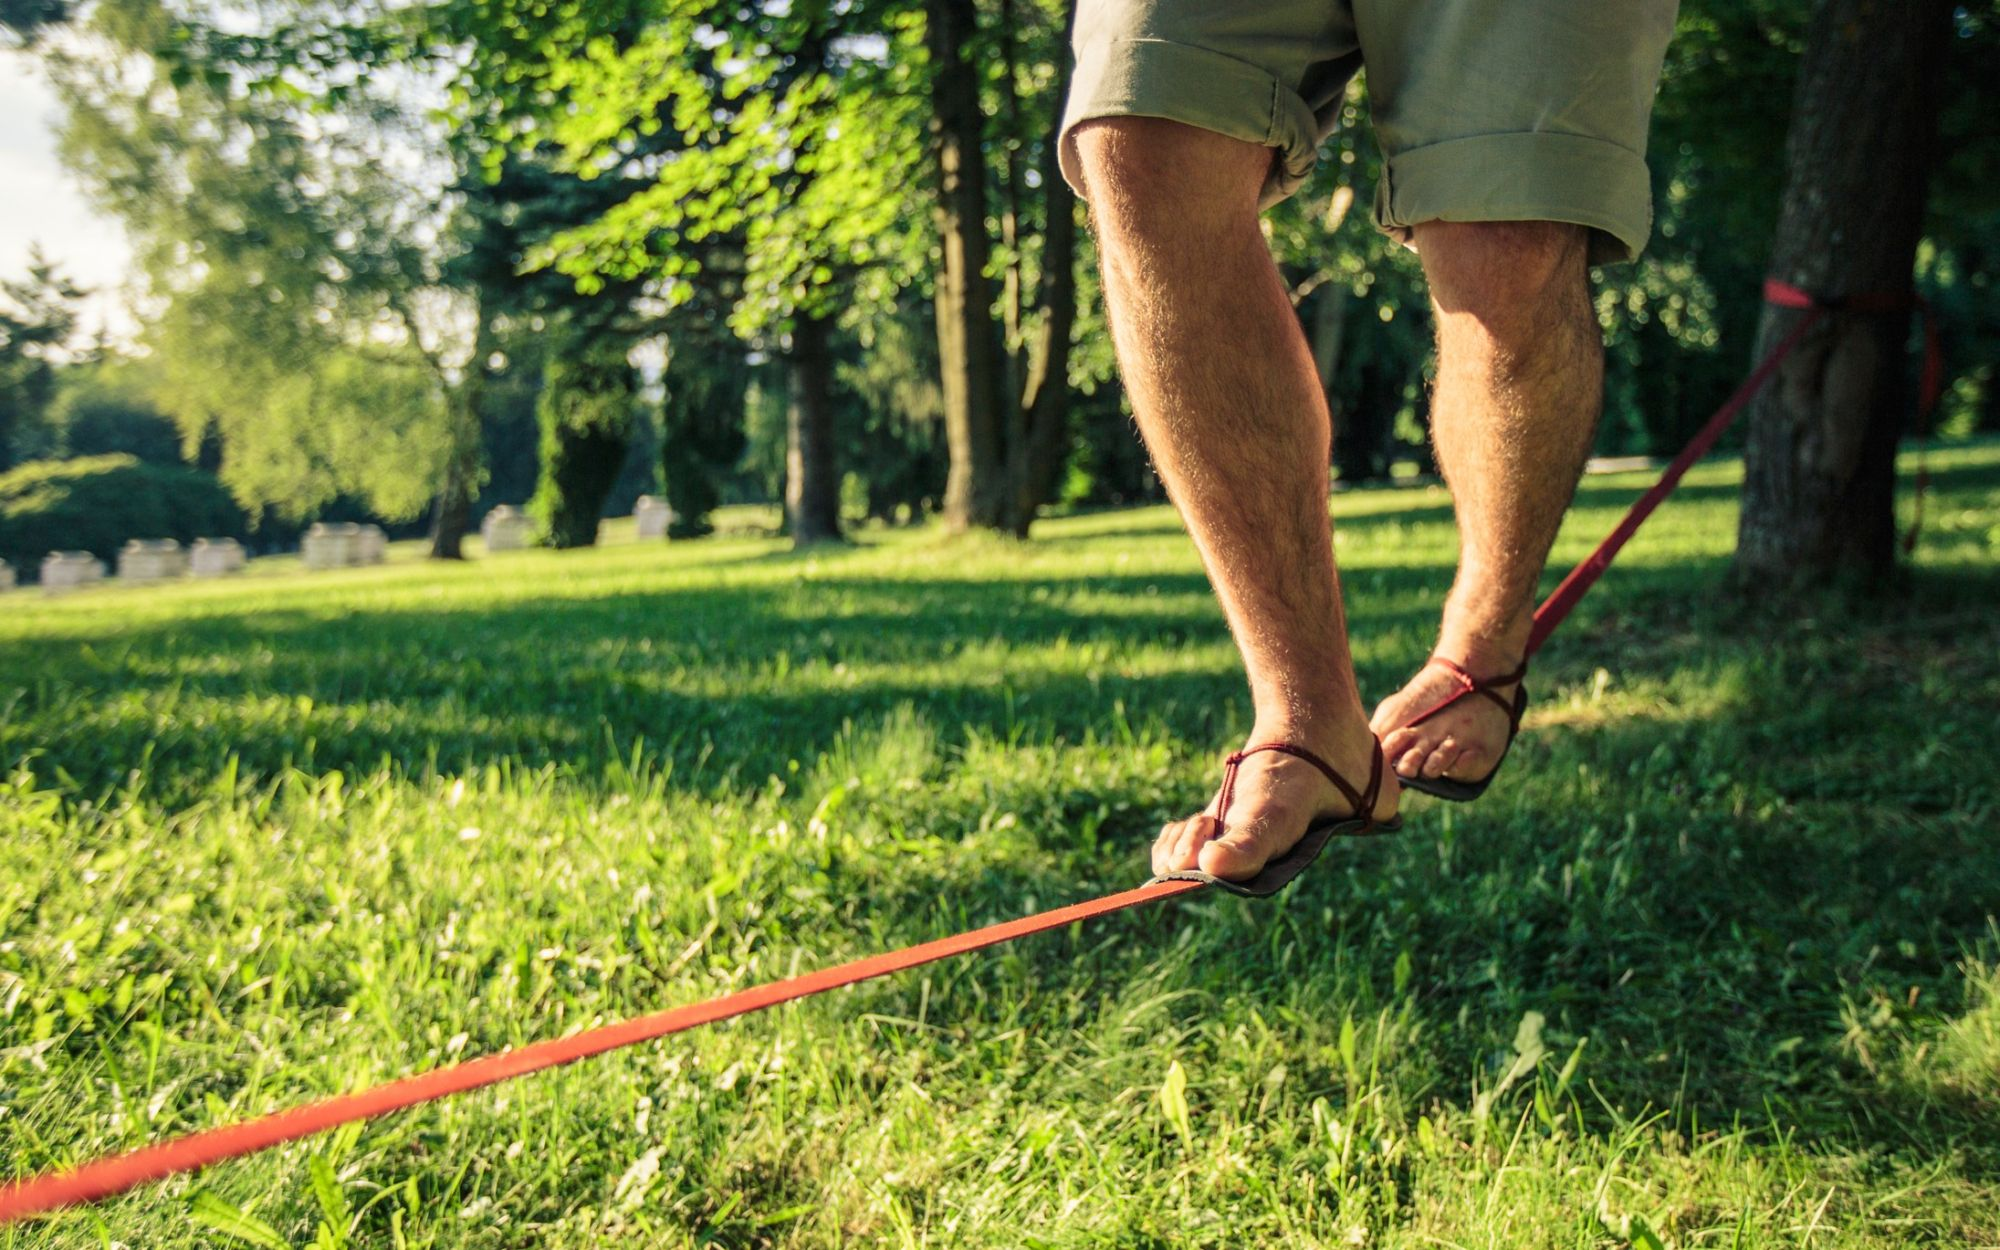 Barefoot lifestyle sandály v parku slackline detail